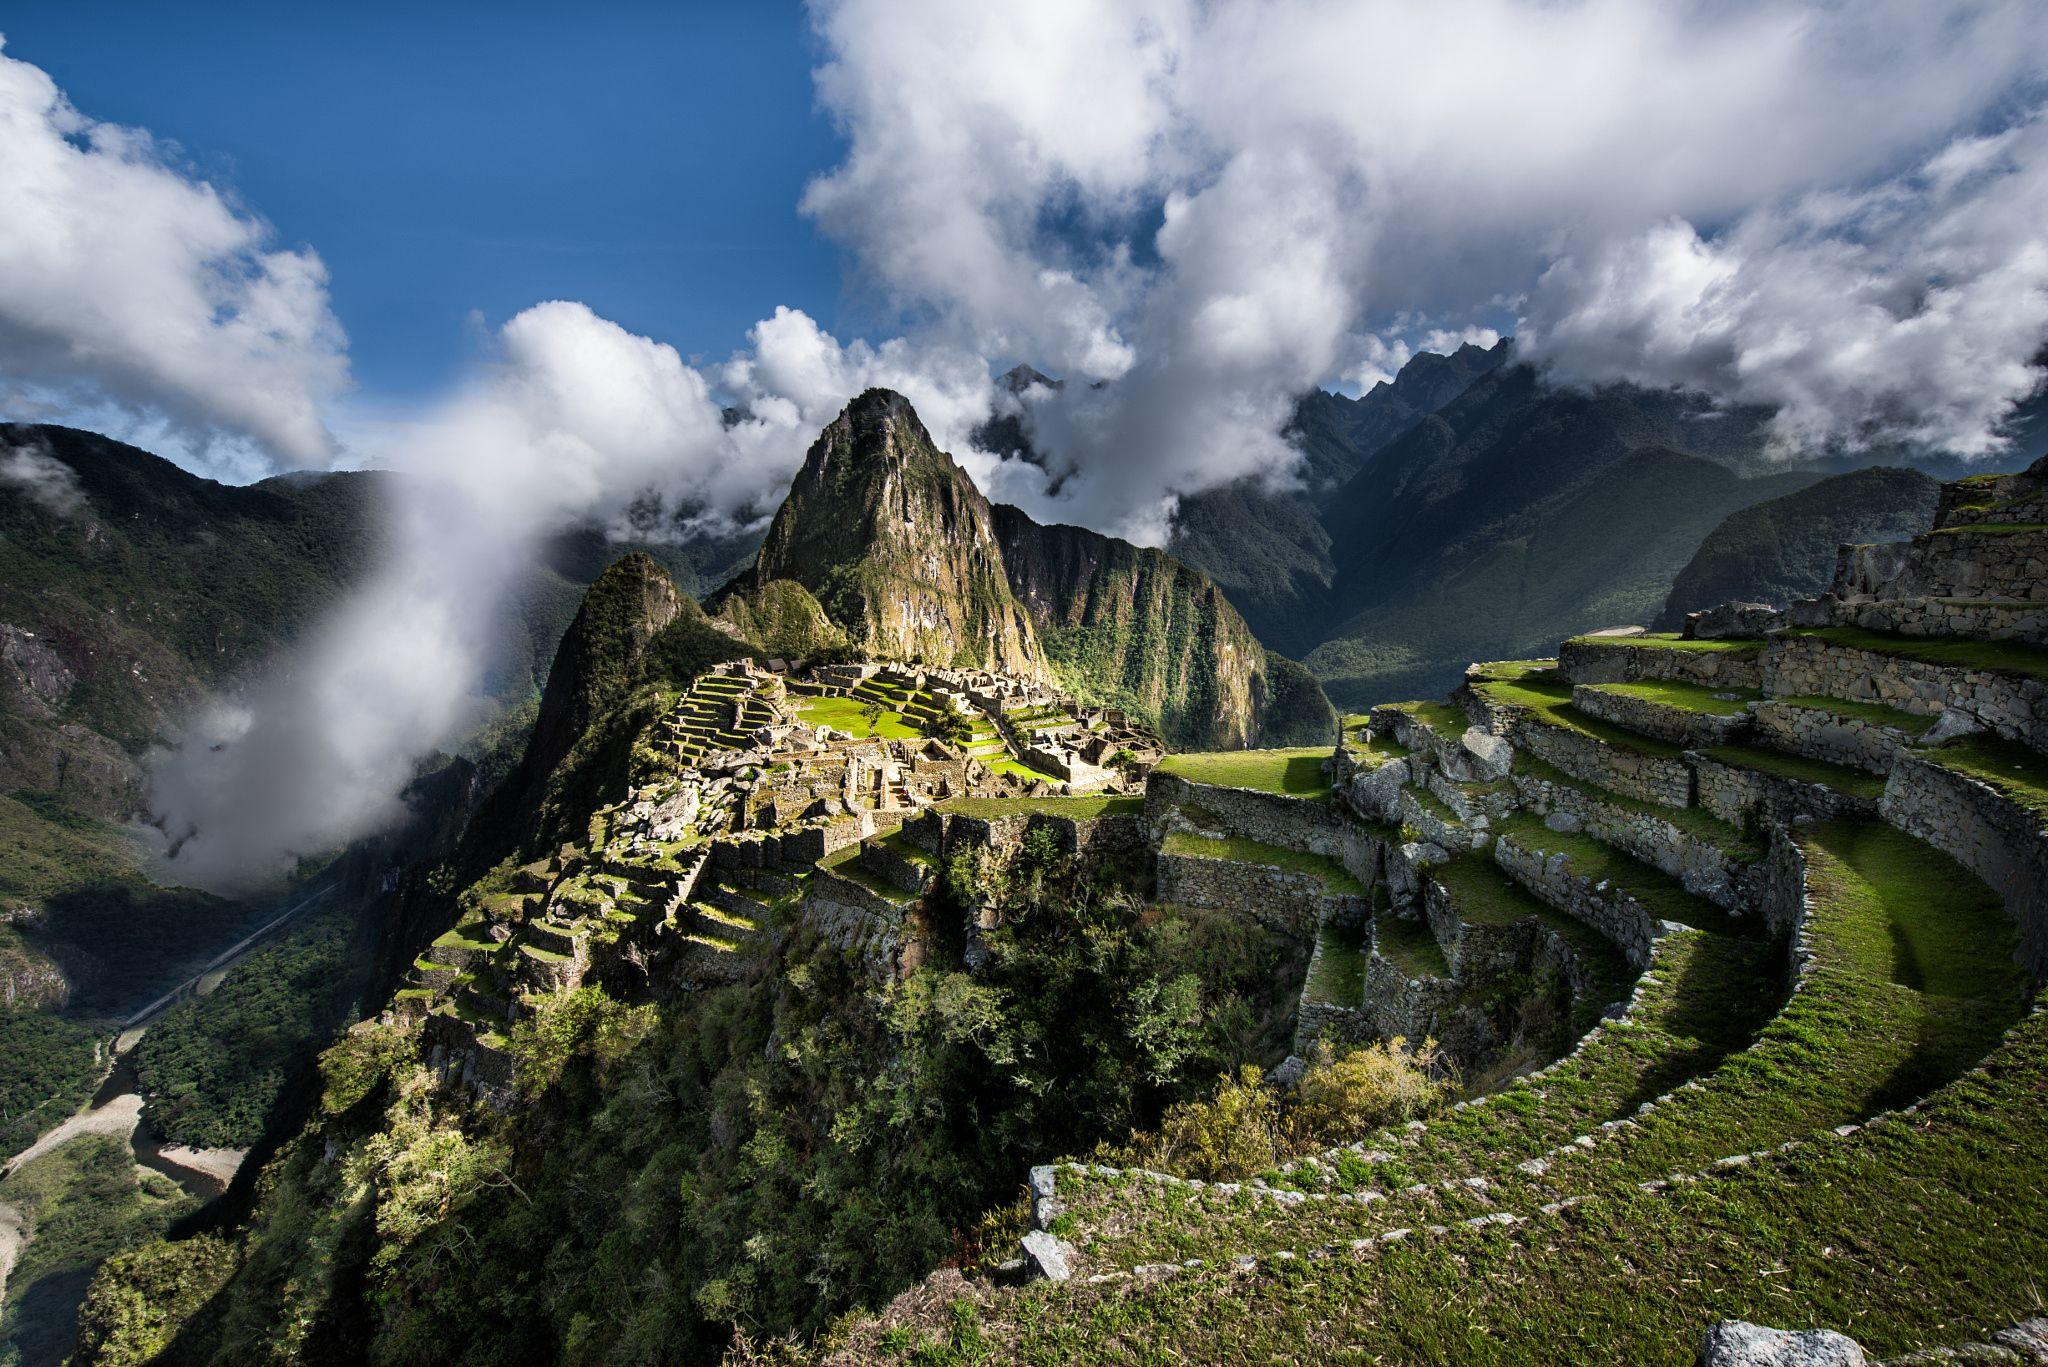 Pikchu Peak - null Machu Picchu, Urubamba (Perú) Photography by Lou Lu